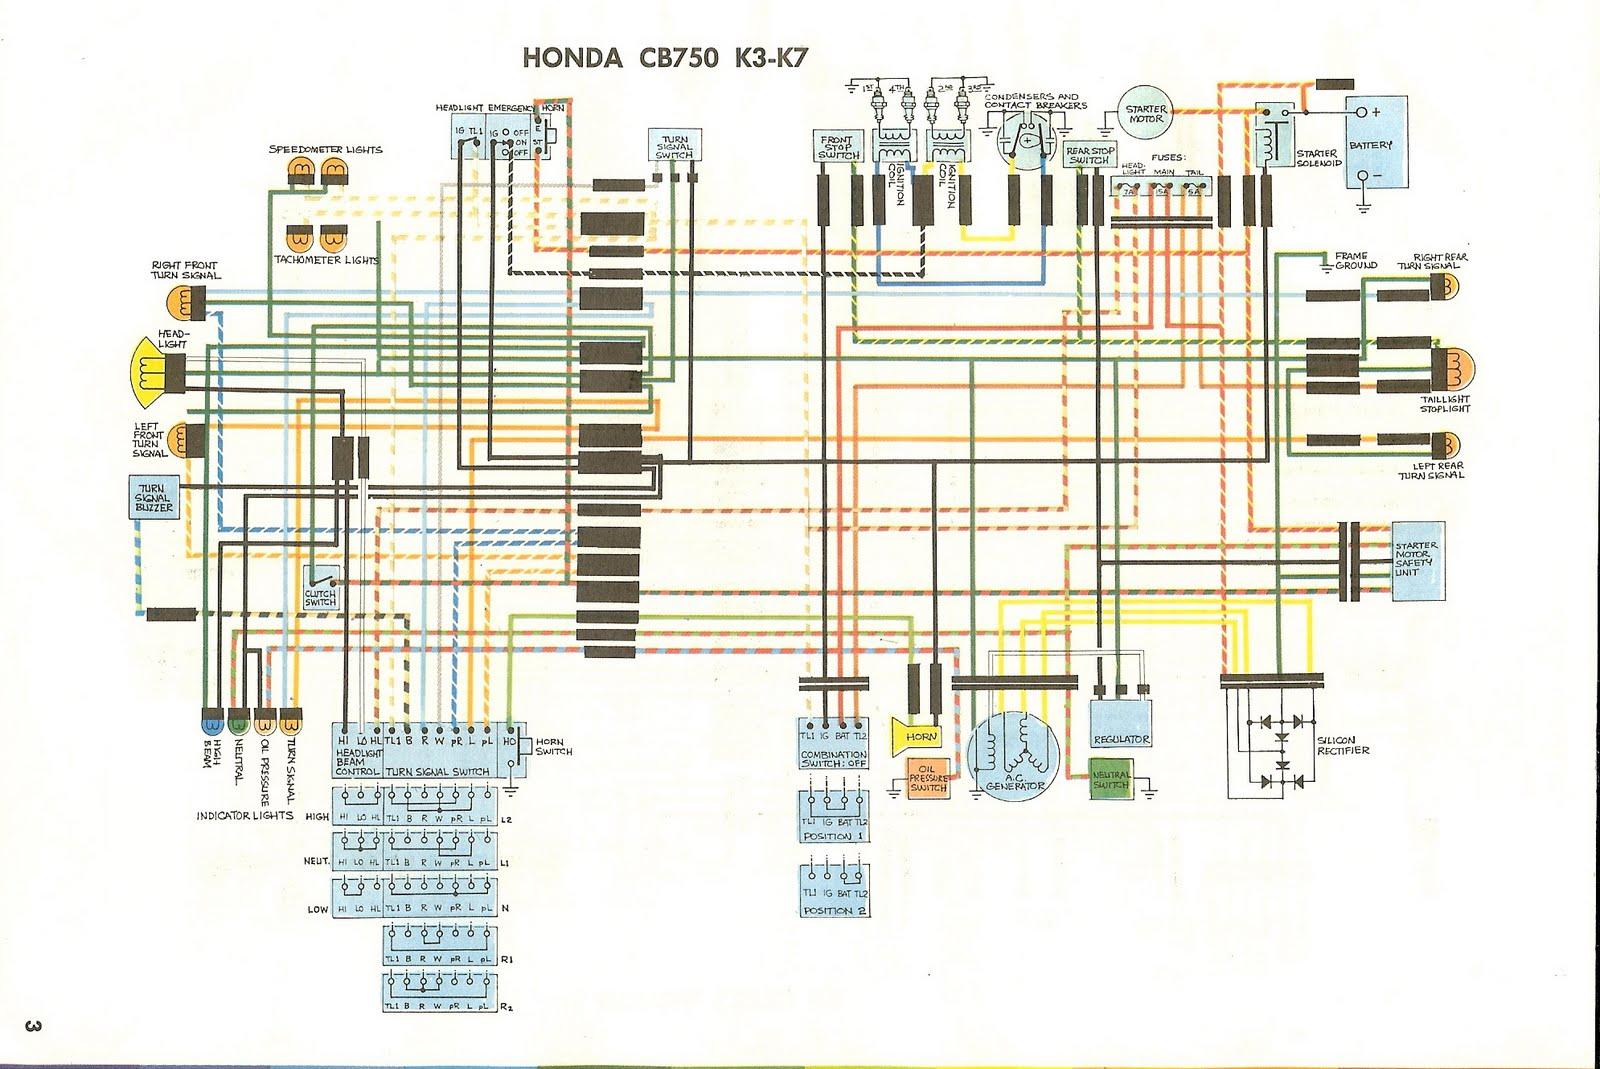 Honda 50 Wiring Diagram Honda Z50 Electrical Wiring Diagram 2014